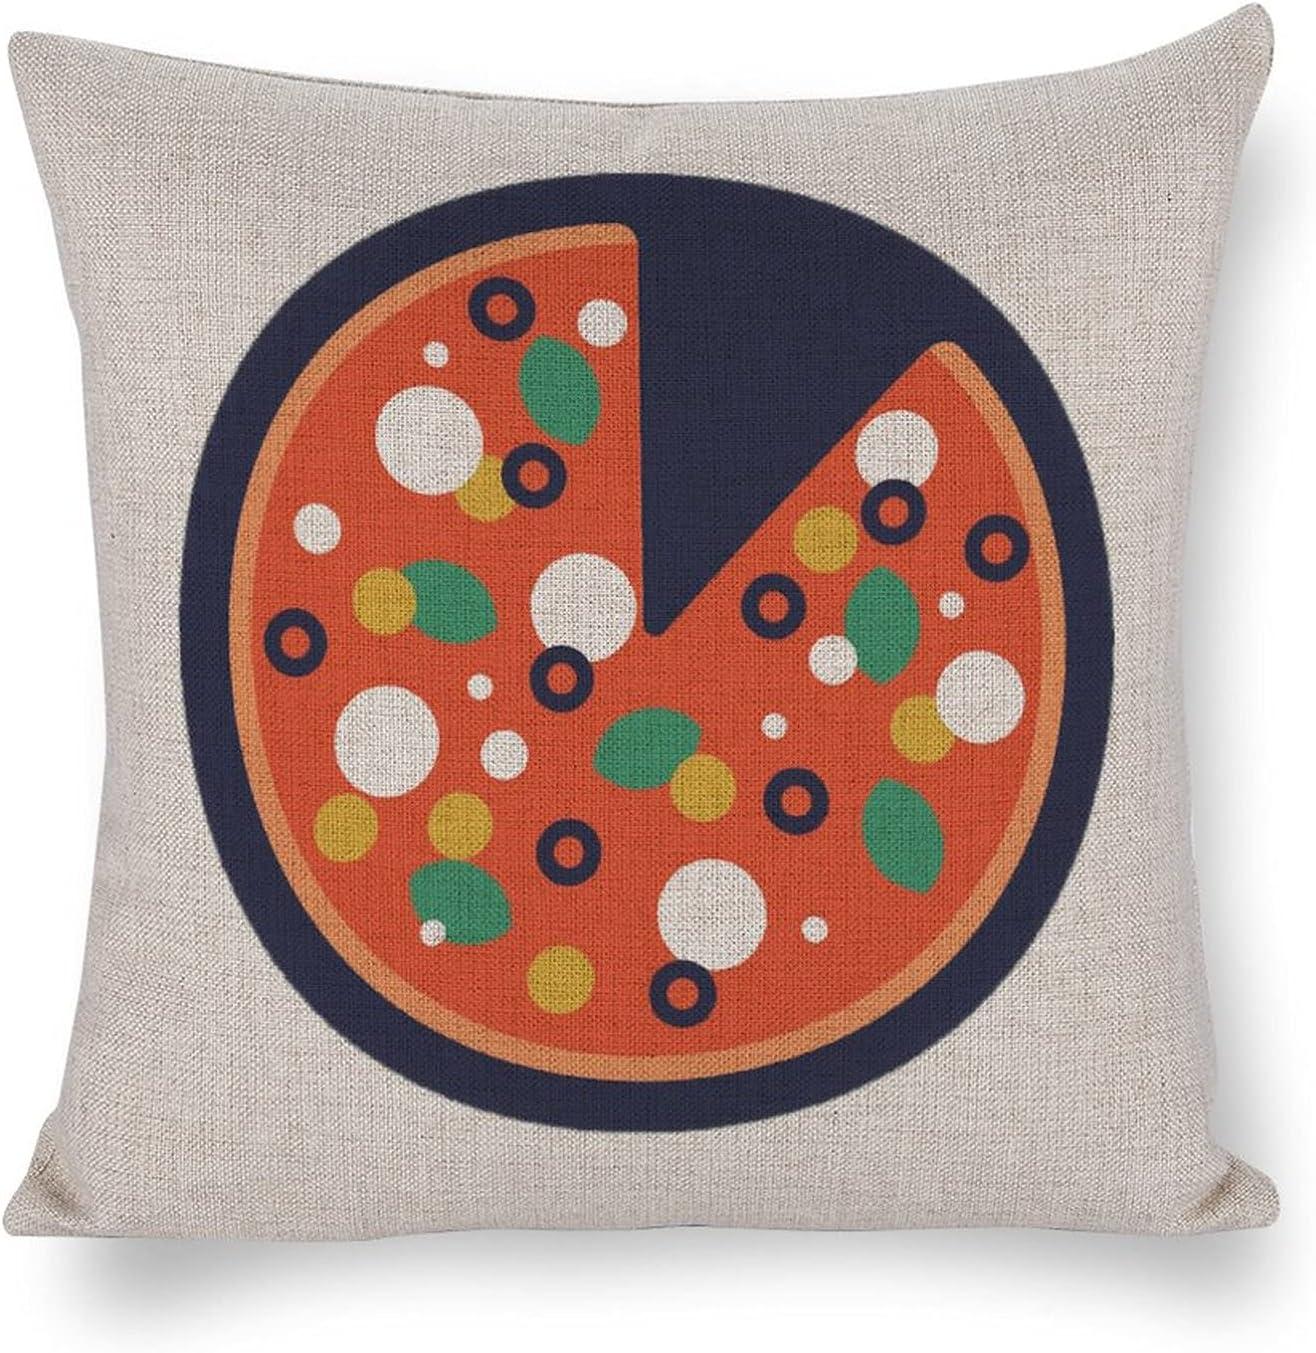 UTF4C Max 51% OFF Font Illustration Button Pizza Linen Cotton Ranking TOP14 Sofa Cushion H